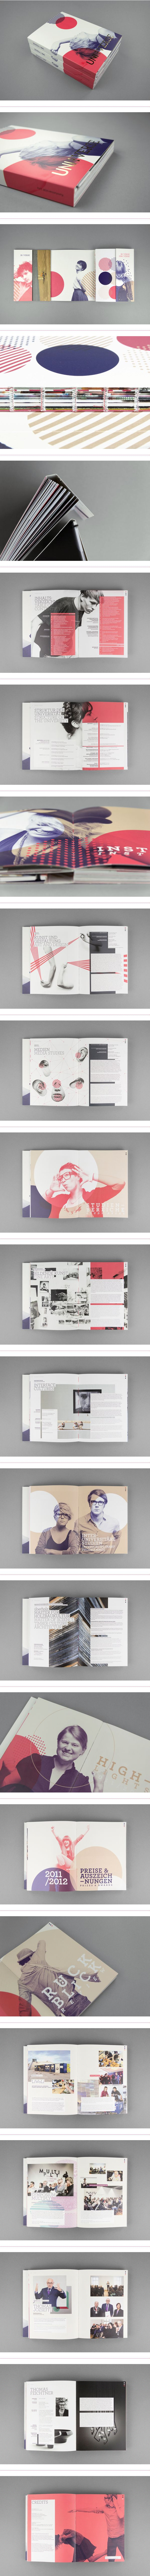 UNI:VERSE 2012 by MOOI